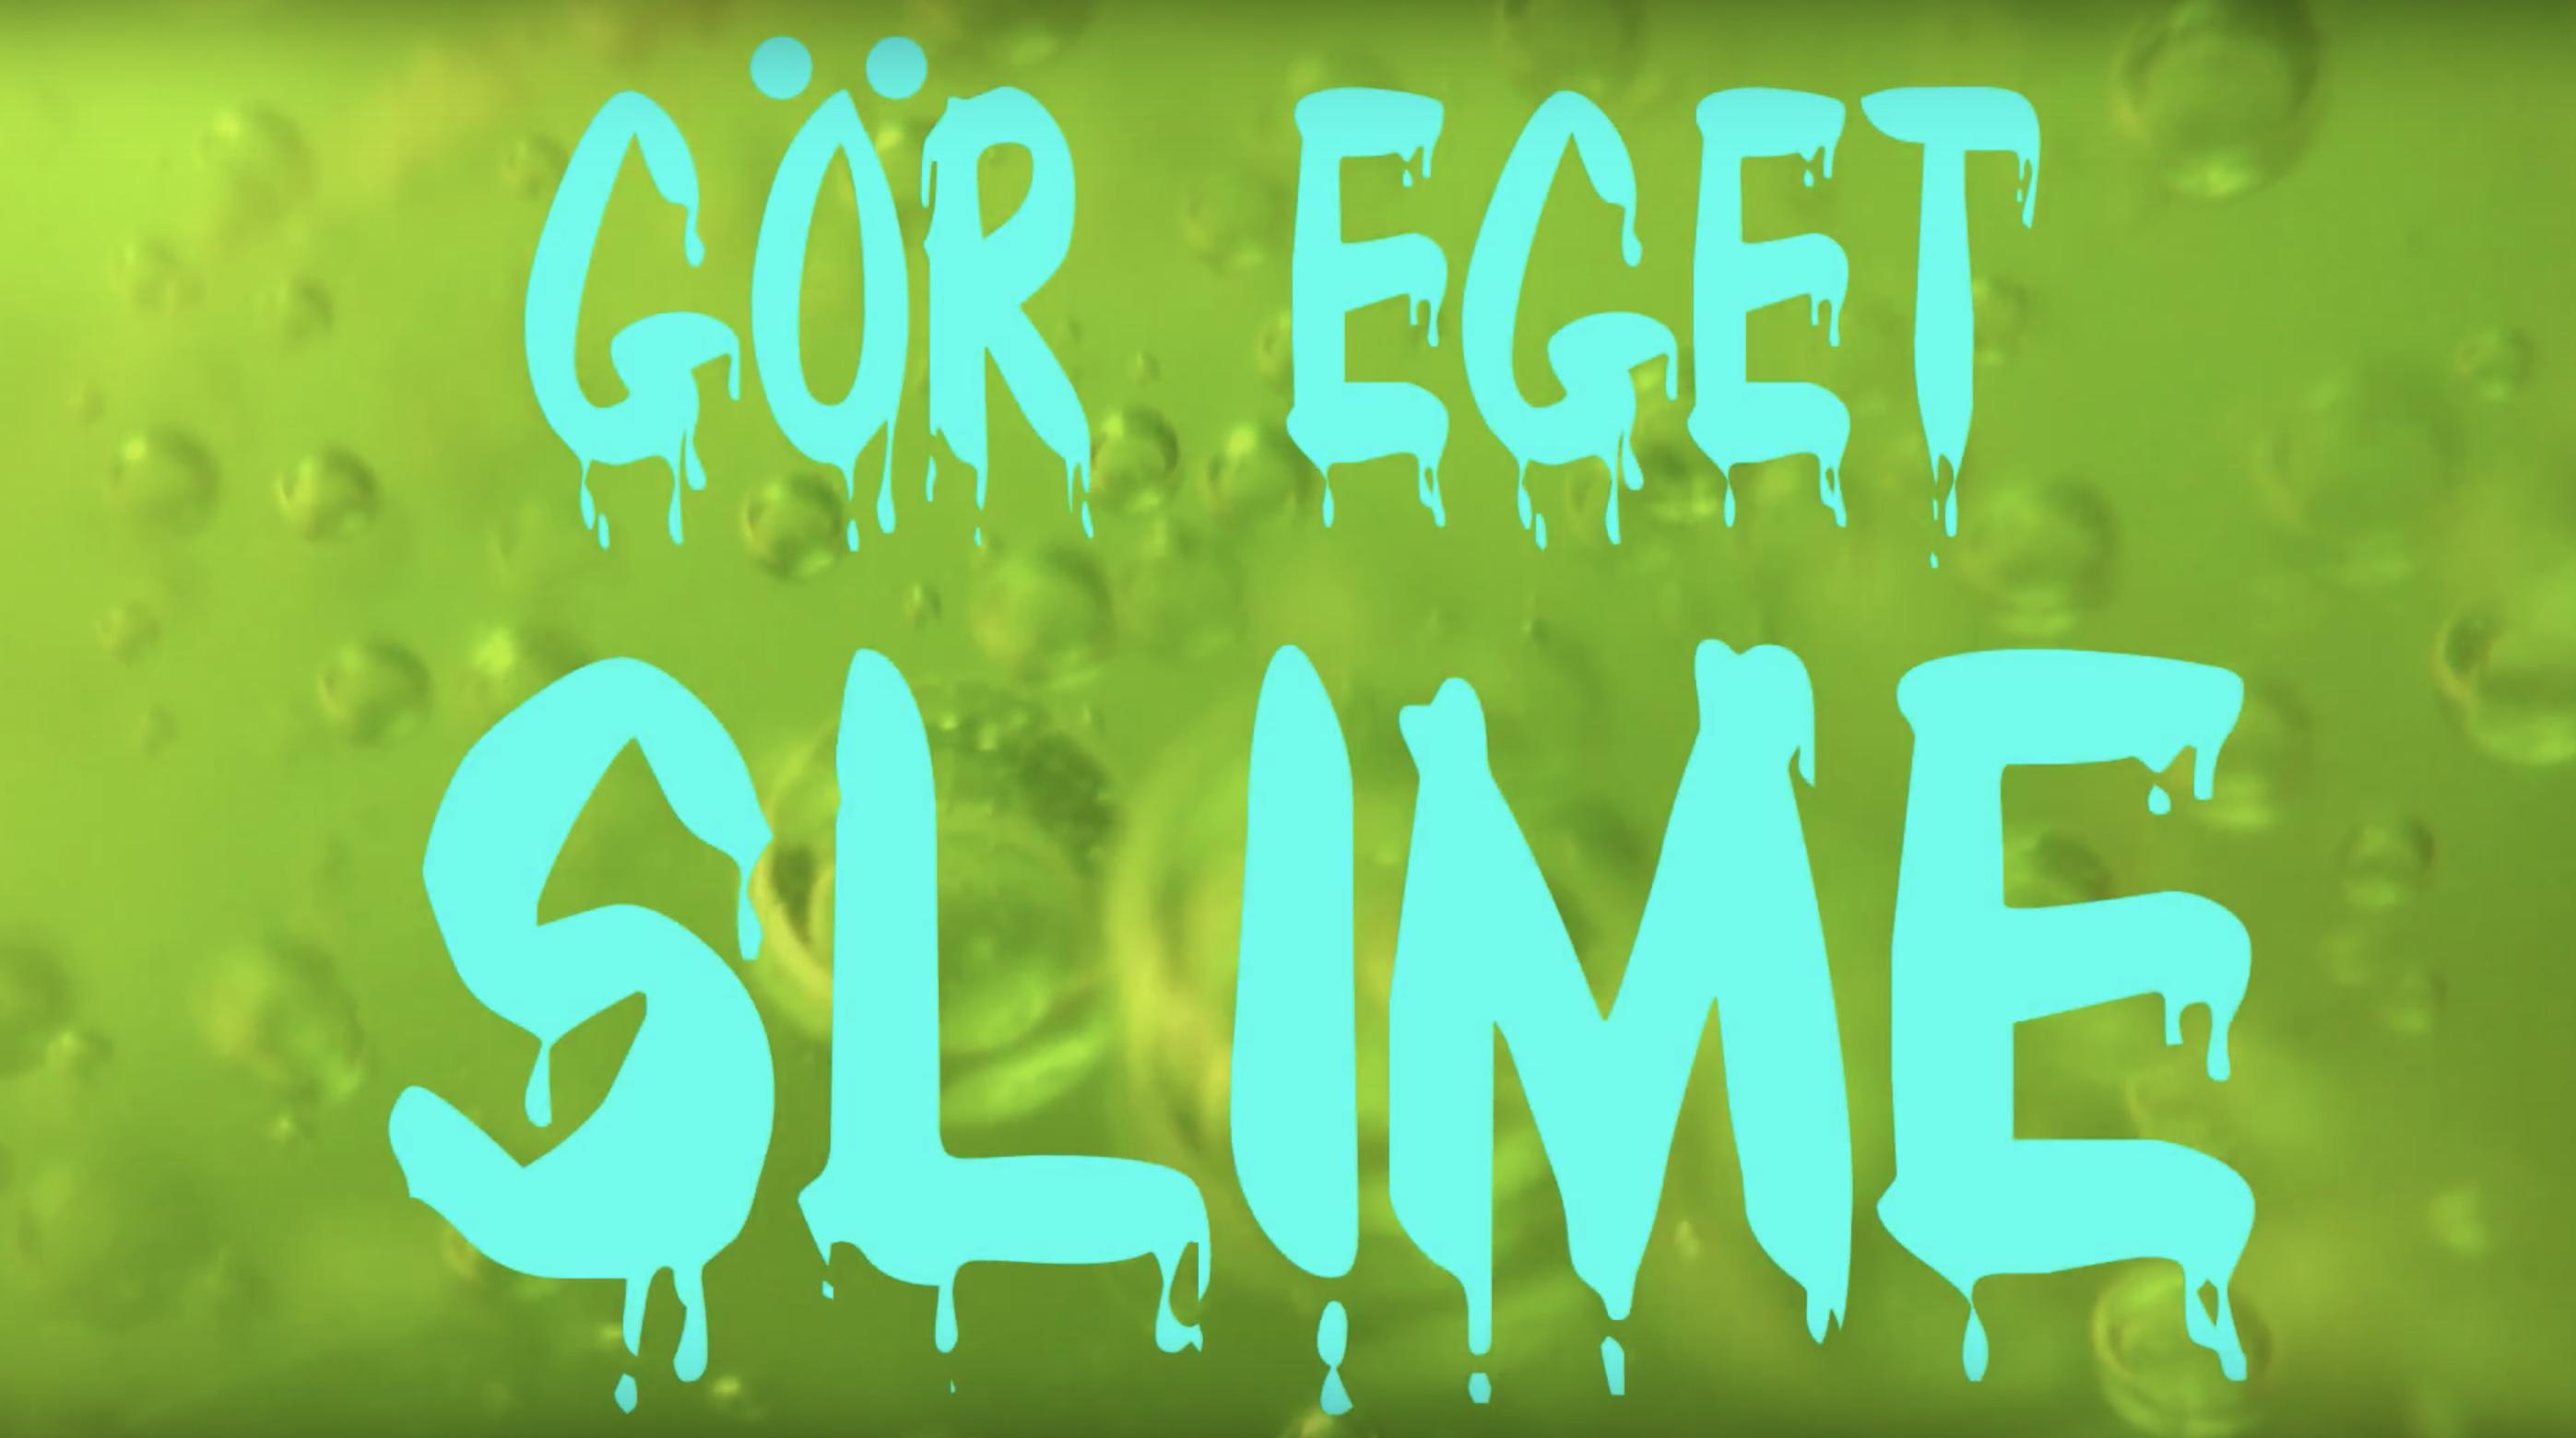 Göra eget slime/slajm - recept